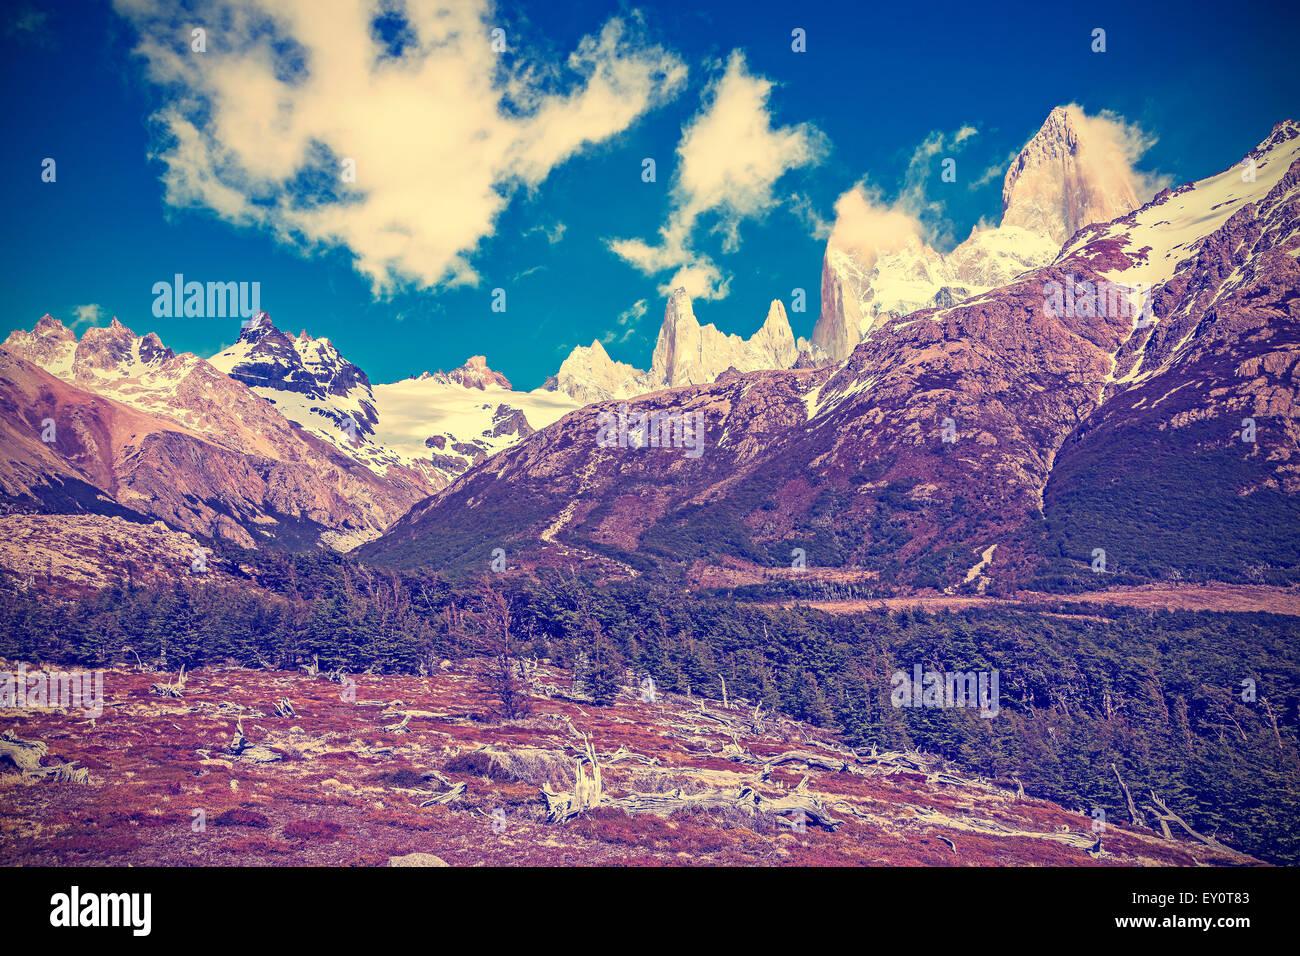 Vintage getönten Fitz-Roy-Bergkette, Argentinien. Stockbild